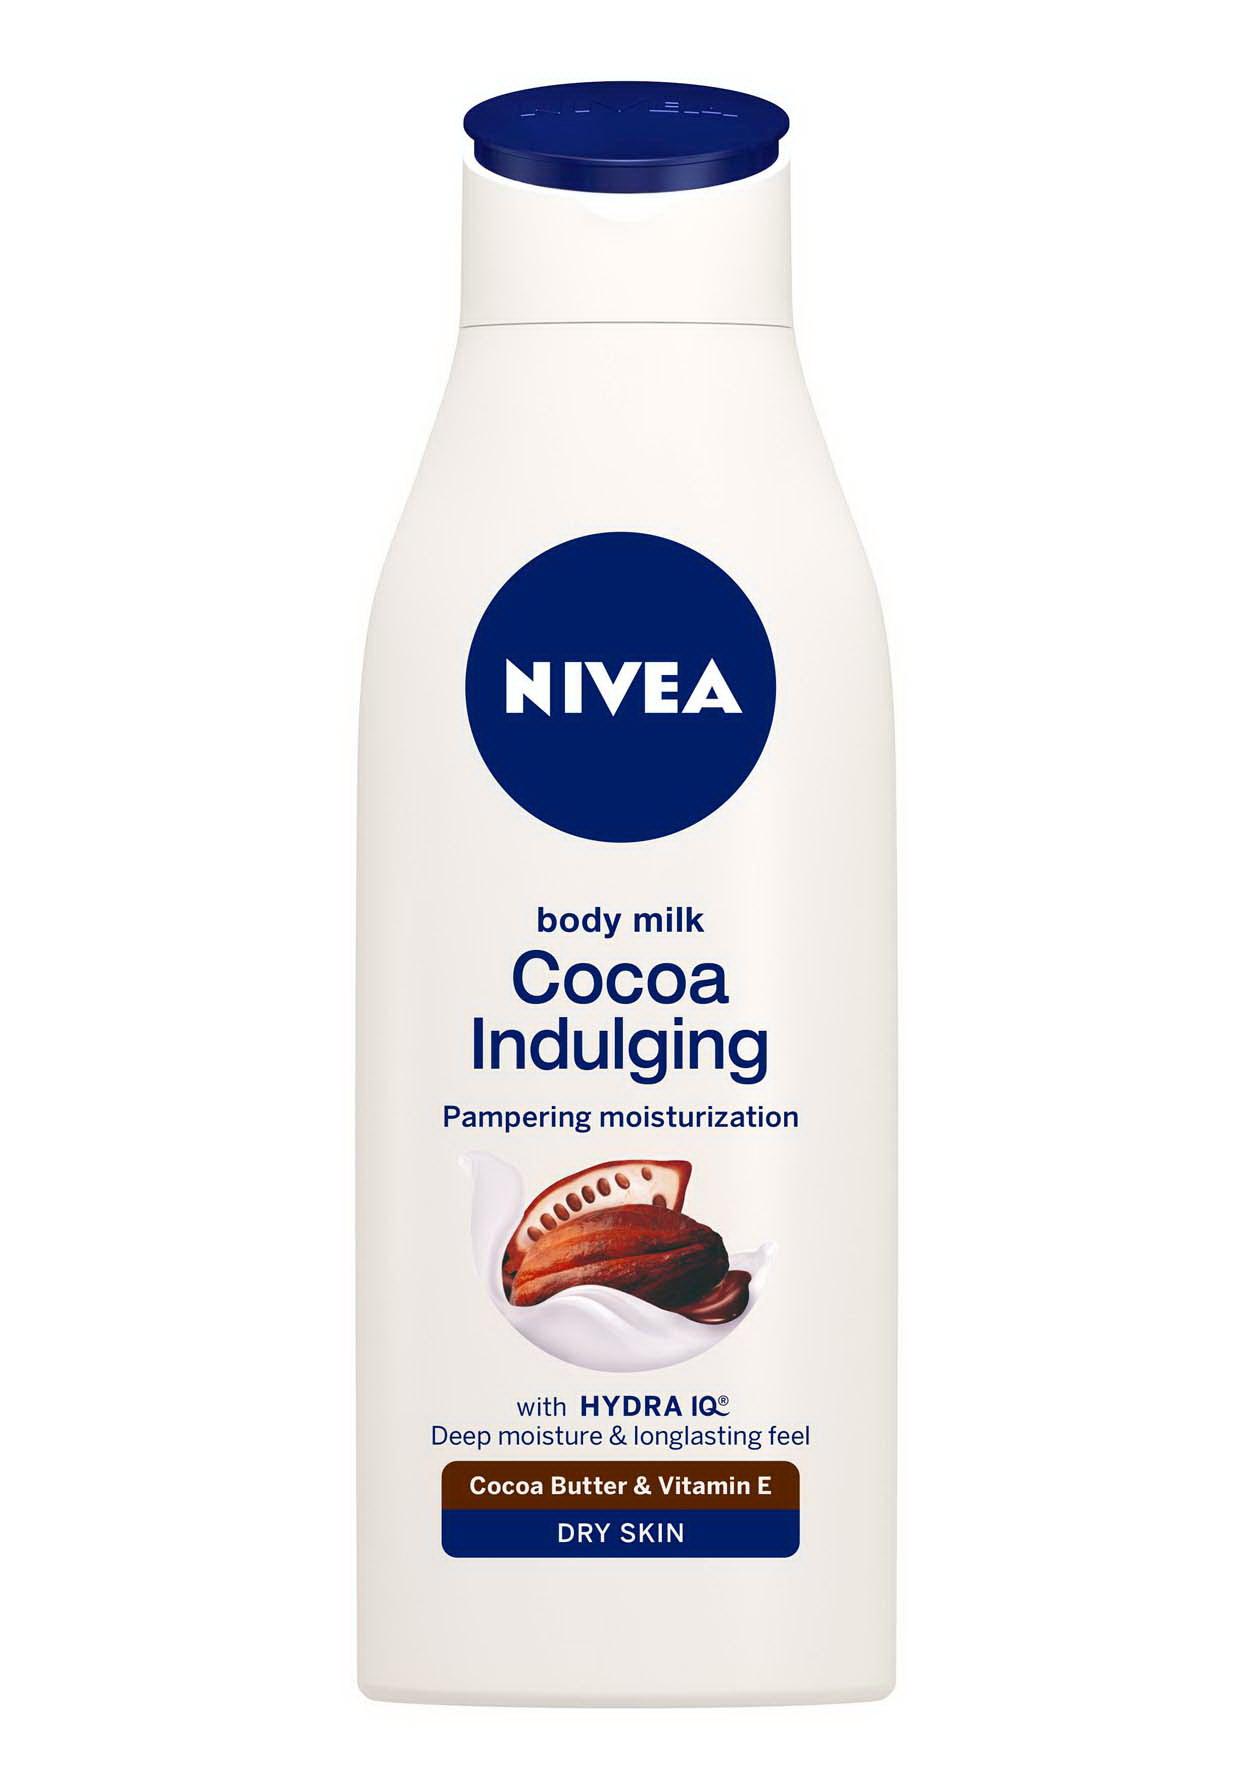 NIVEA Cocoa Indulging Testápoló Tej 1249Ft